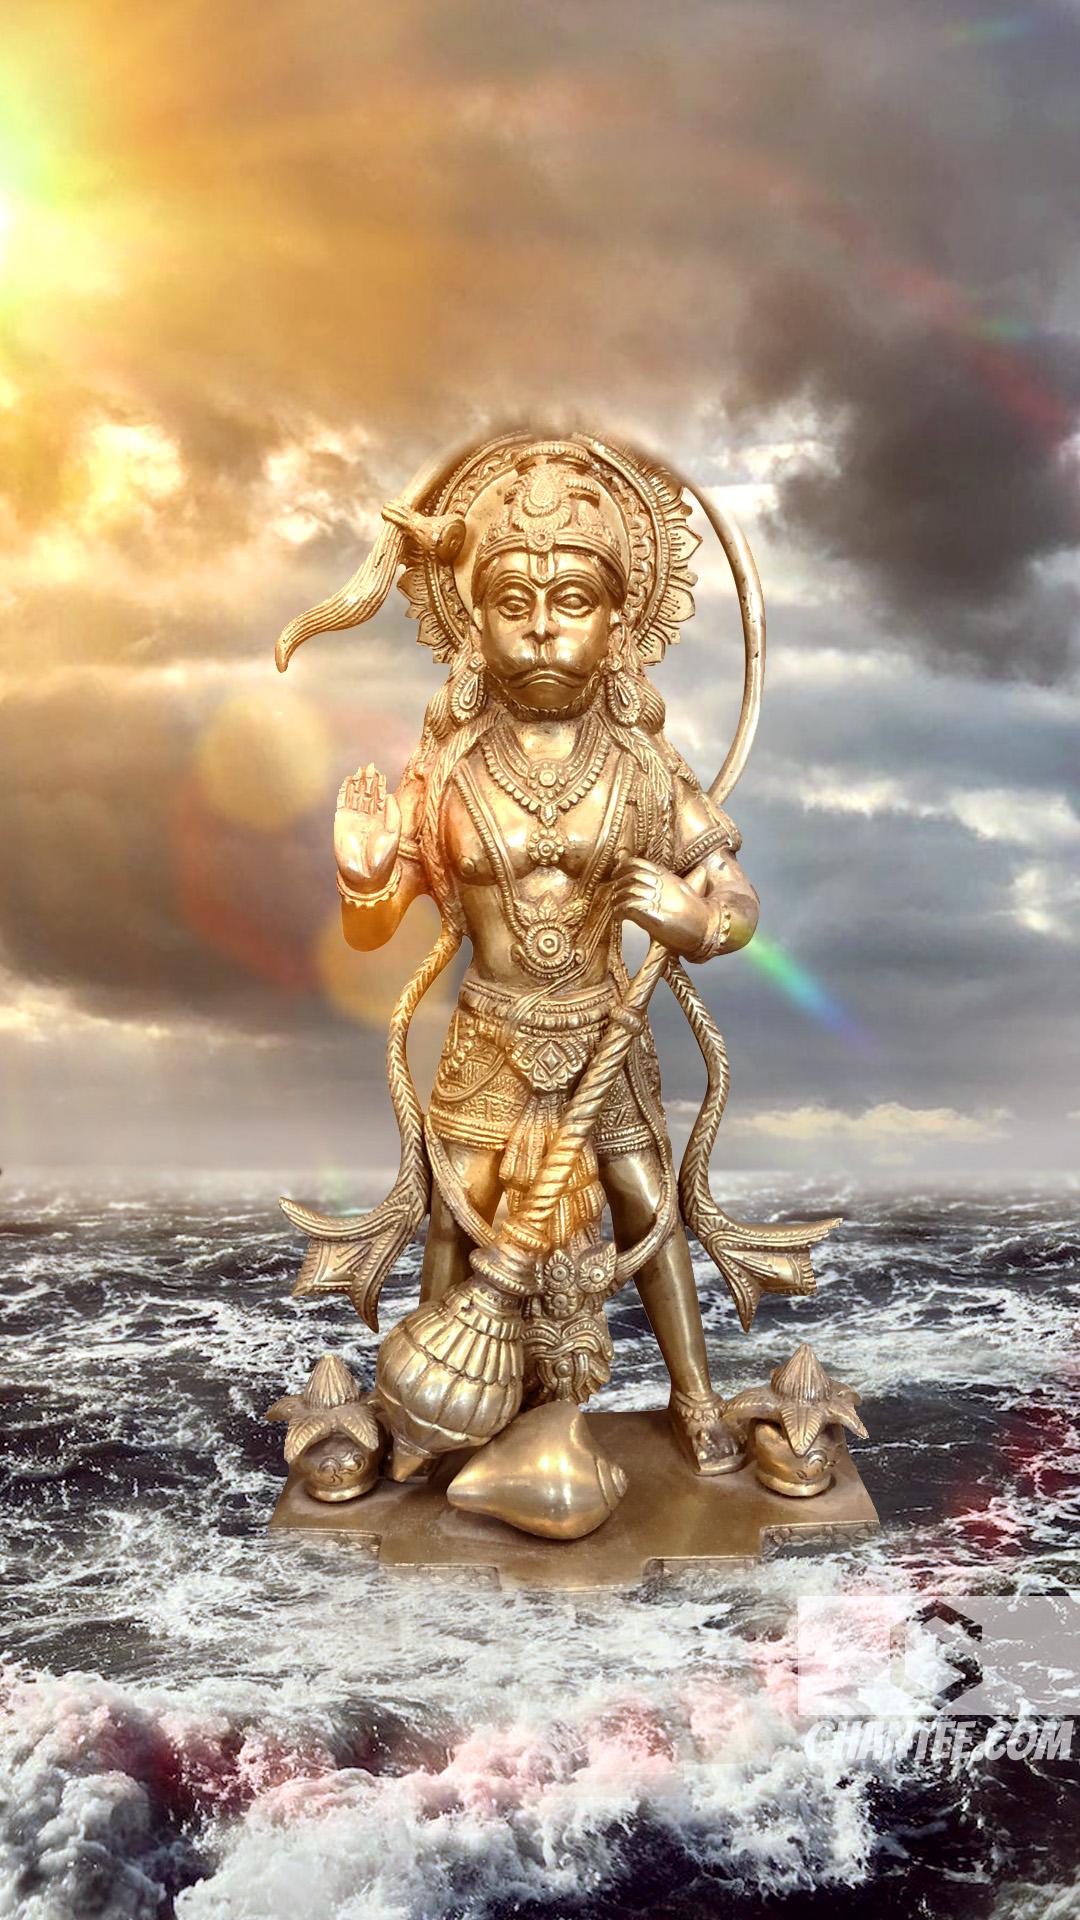 hanuman ji murti in the middle of the ocean